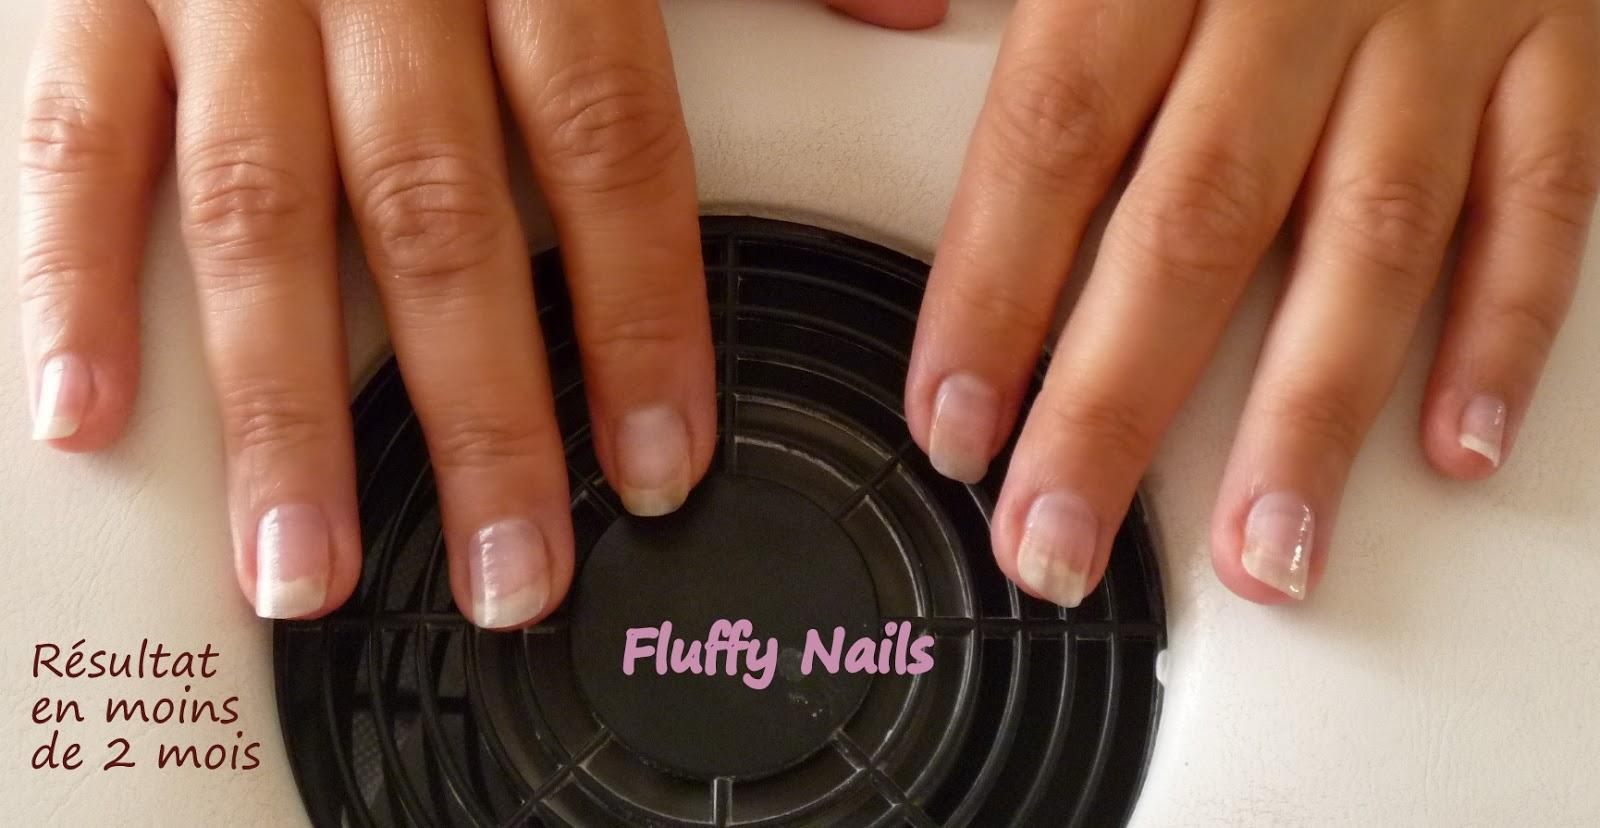 fluffy nails comment arr ter de se ronger les ongles gr ce aux faux ongles en gel. Black Bedroom Furniture Sets. Home Design Ideas